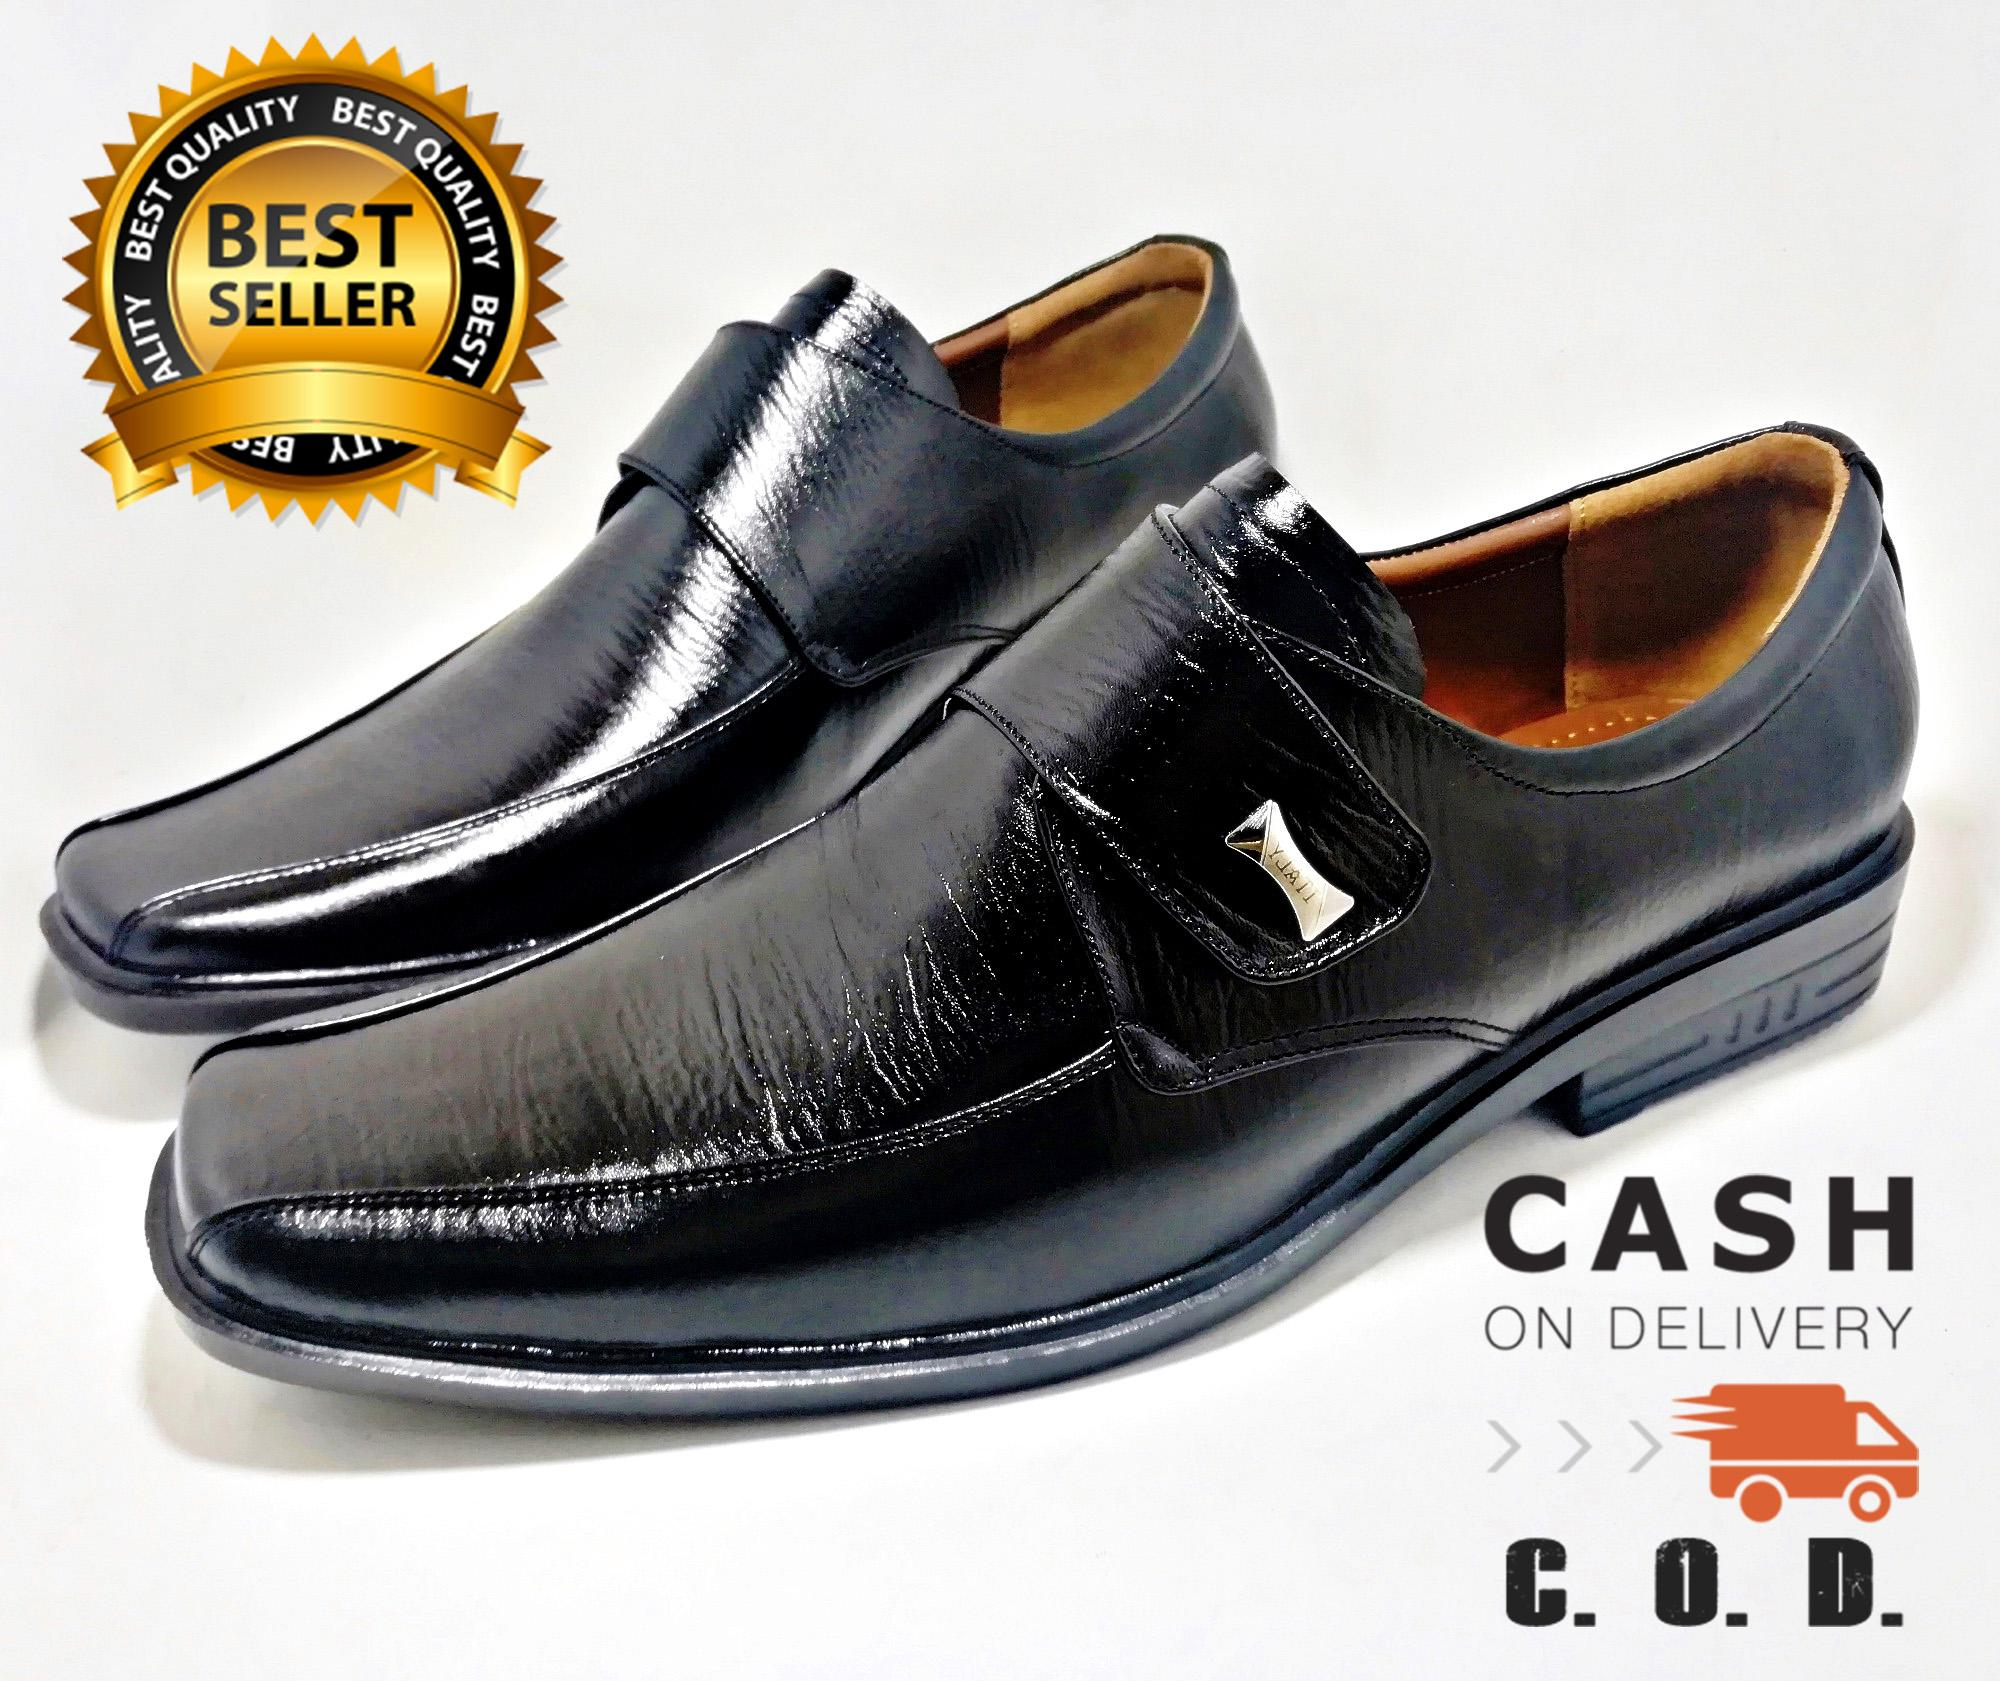 Sepatu Kantor Velcro Pria Kulit Asli 100% Bukan Sintetis Tekstur Serat Kayu  Pantofel Big Size 1c28554cec